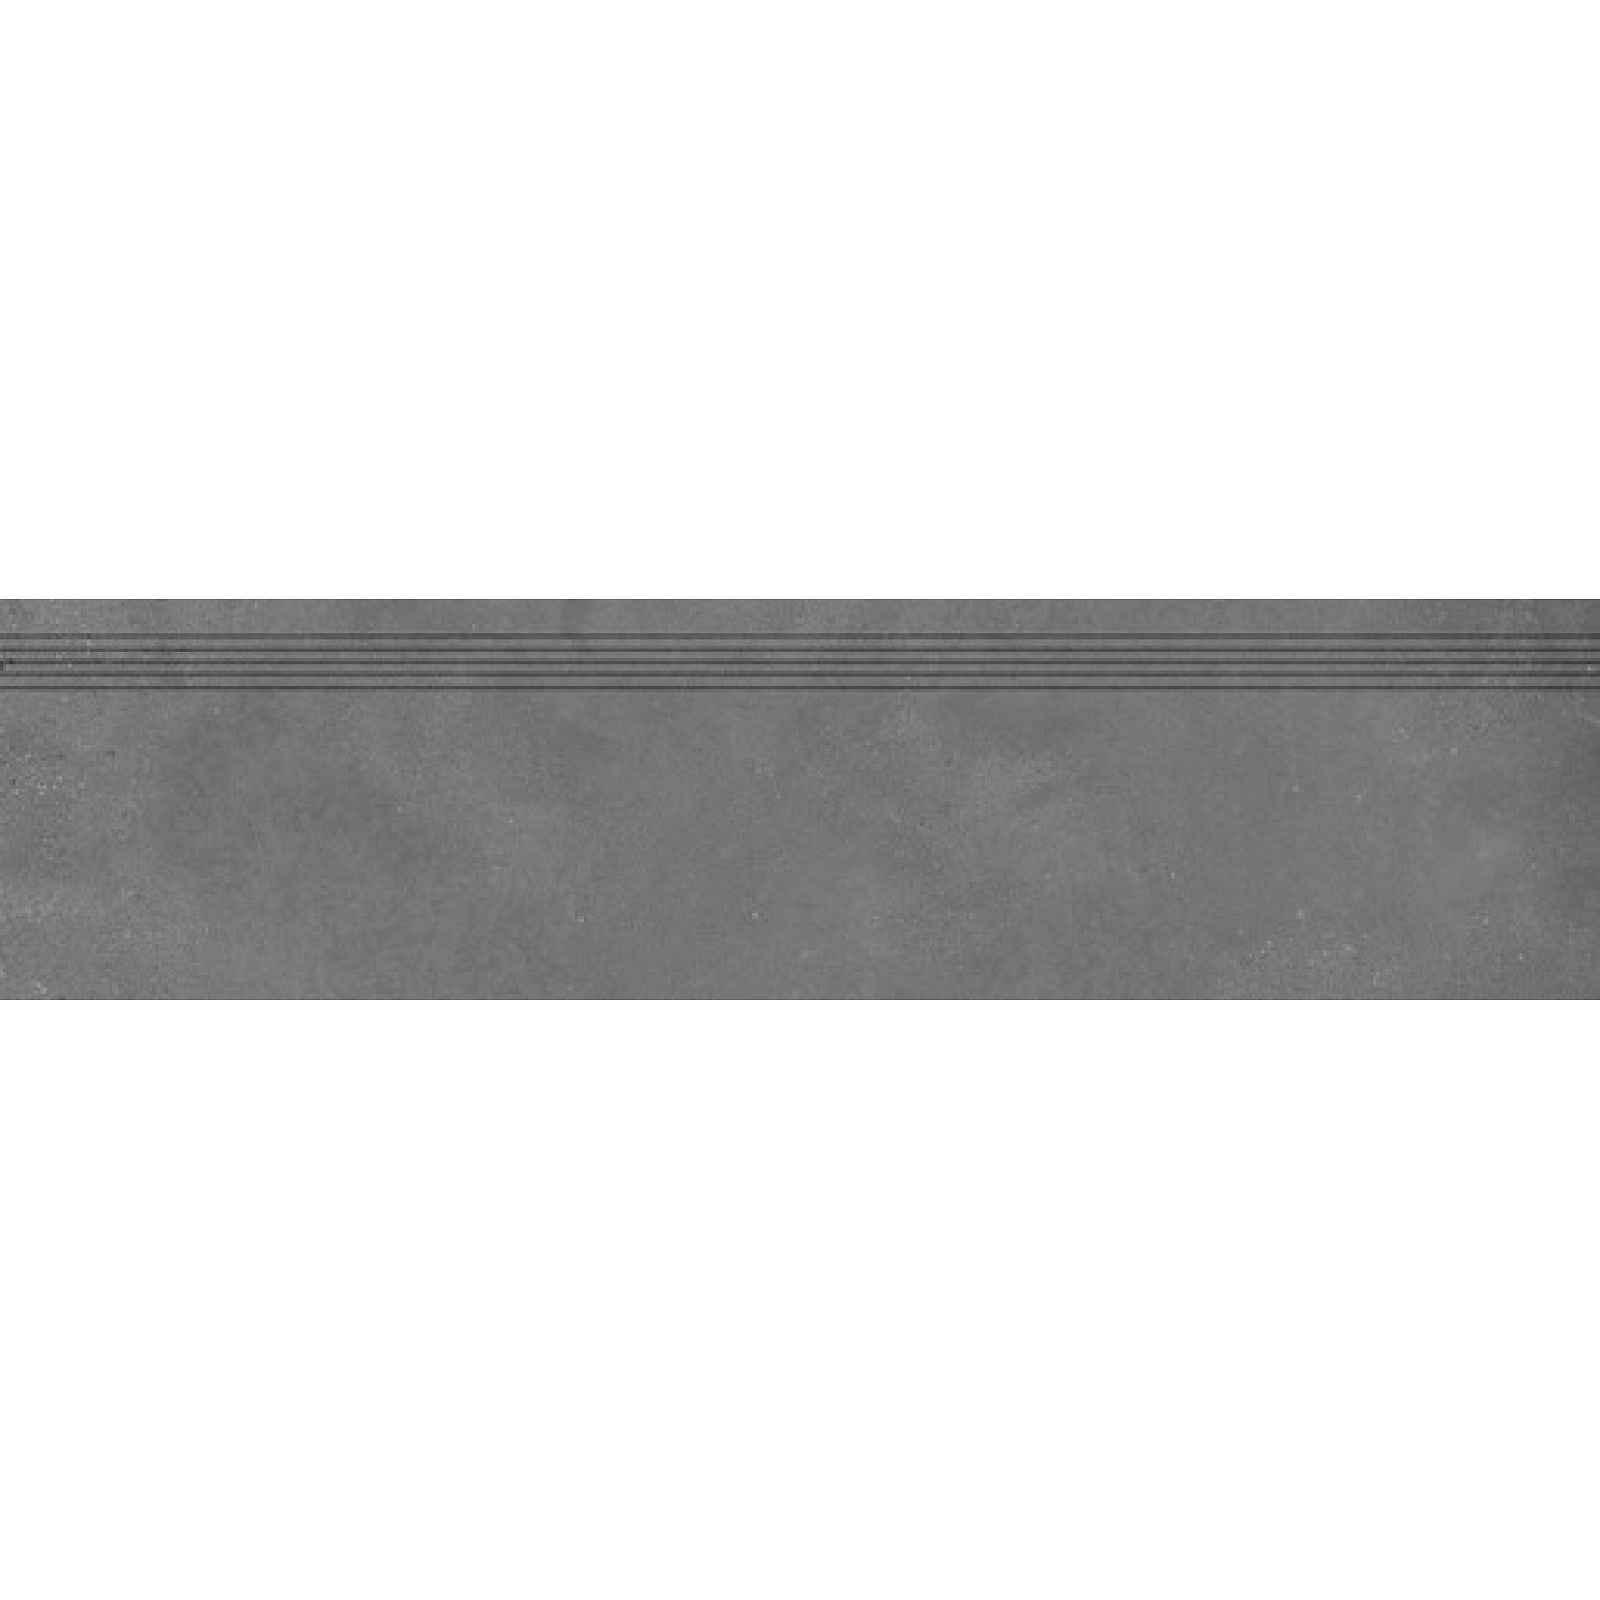 Schodovka RAKO Betonico černá 30x120 cm mat DCPVF792.1